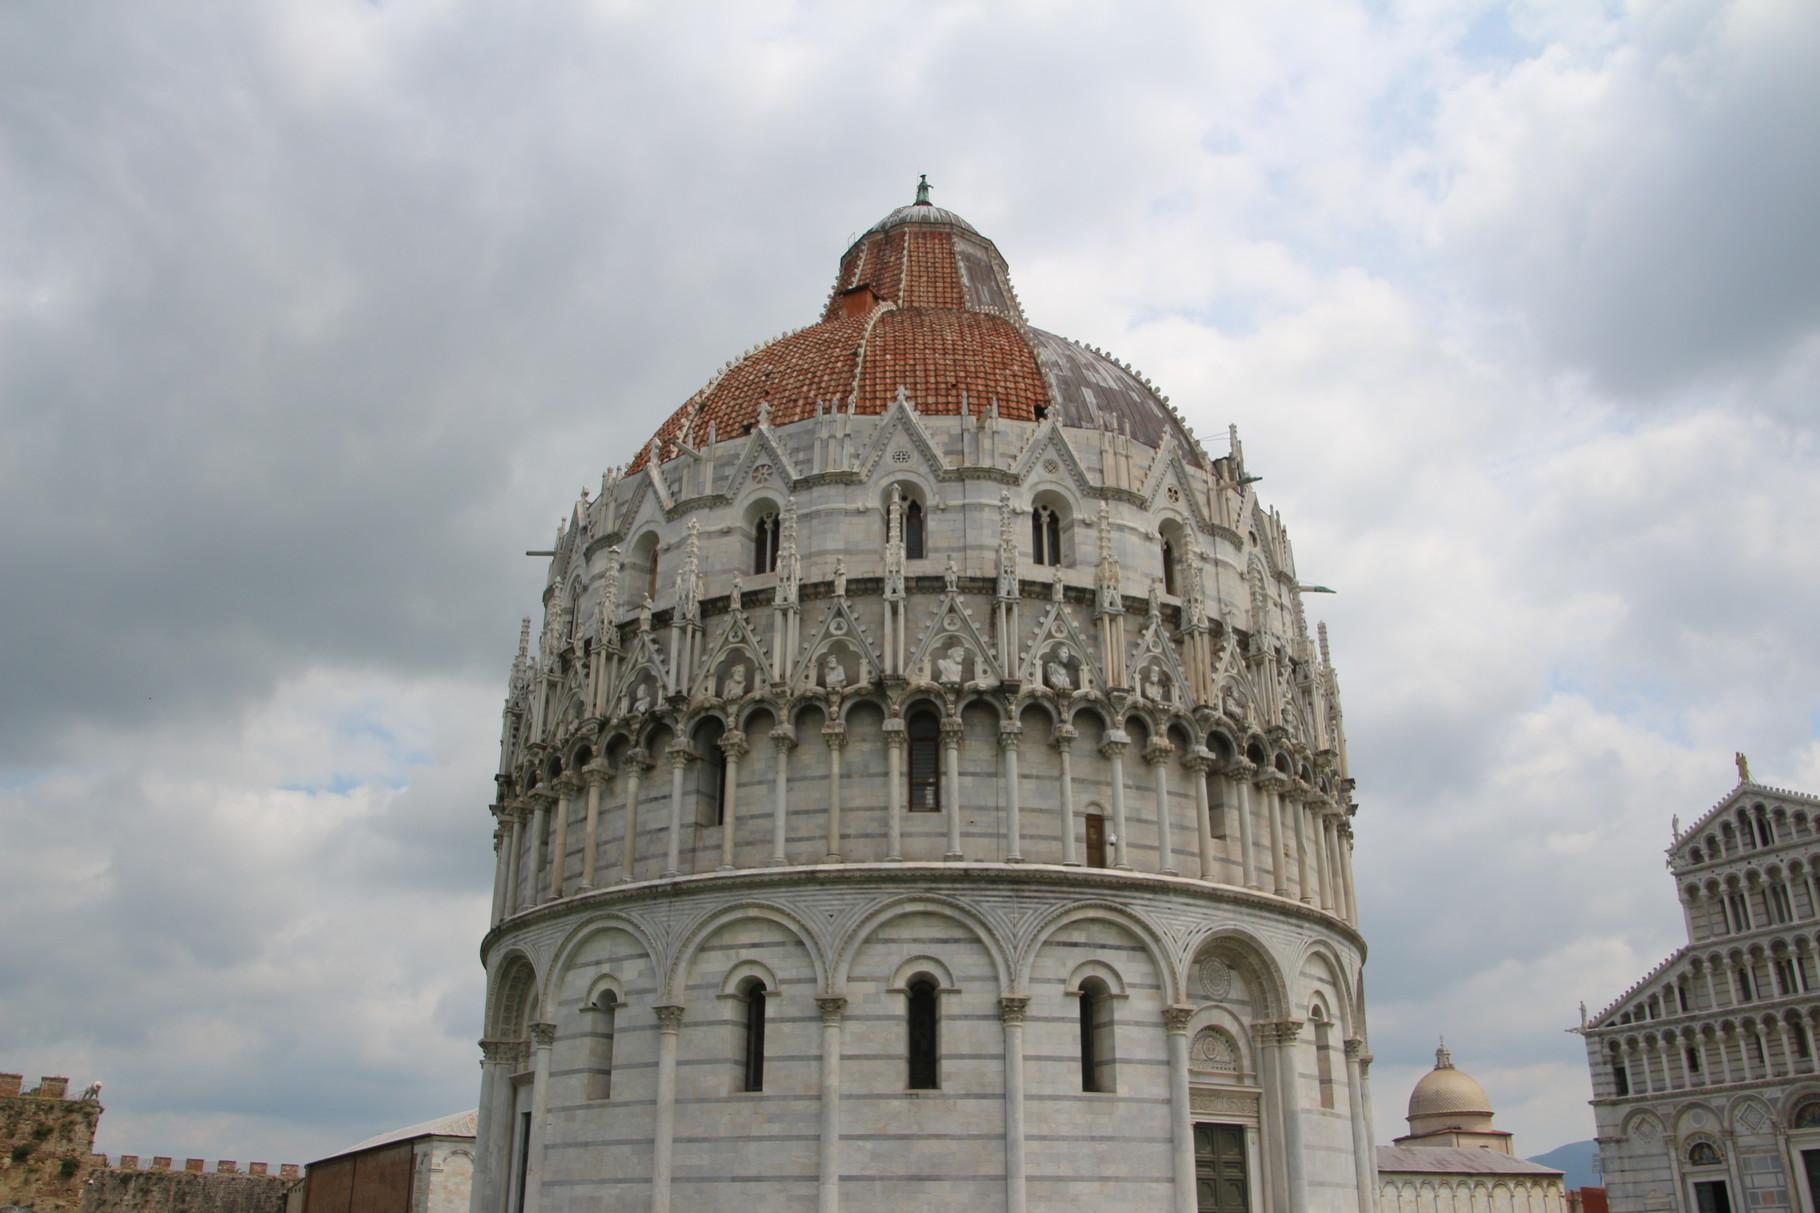 Das Baptisterium - Taufkirche